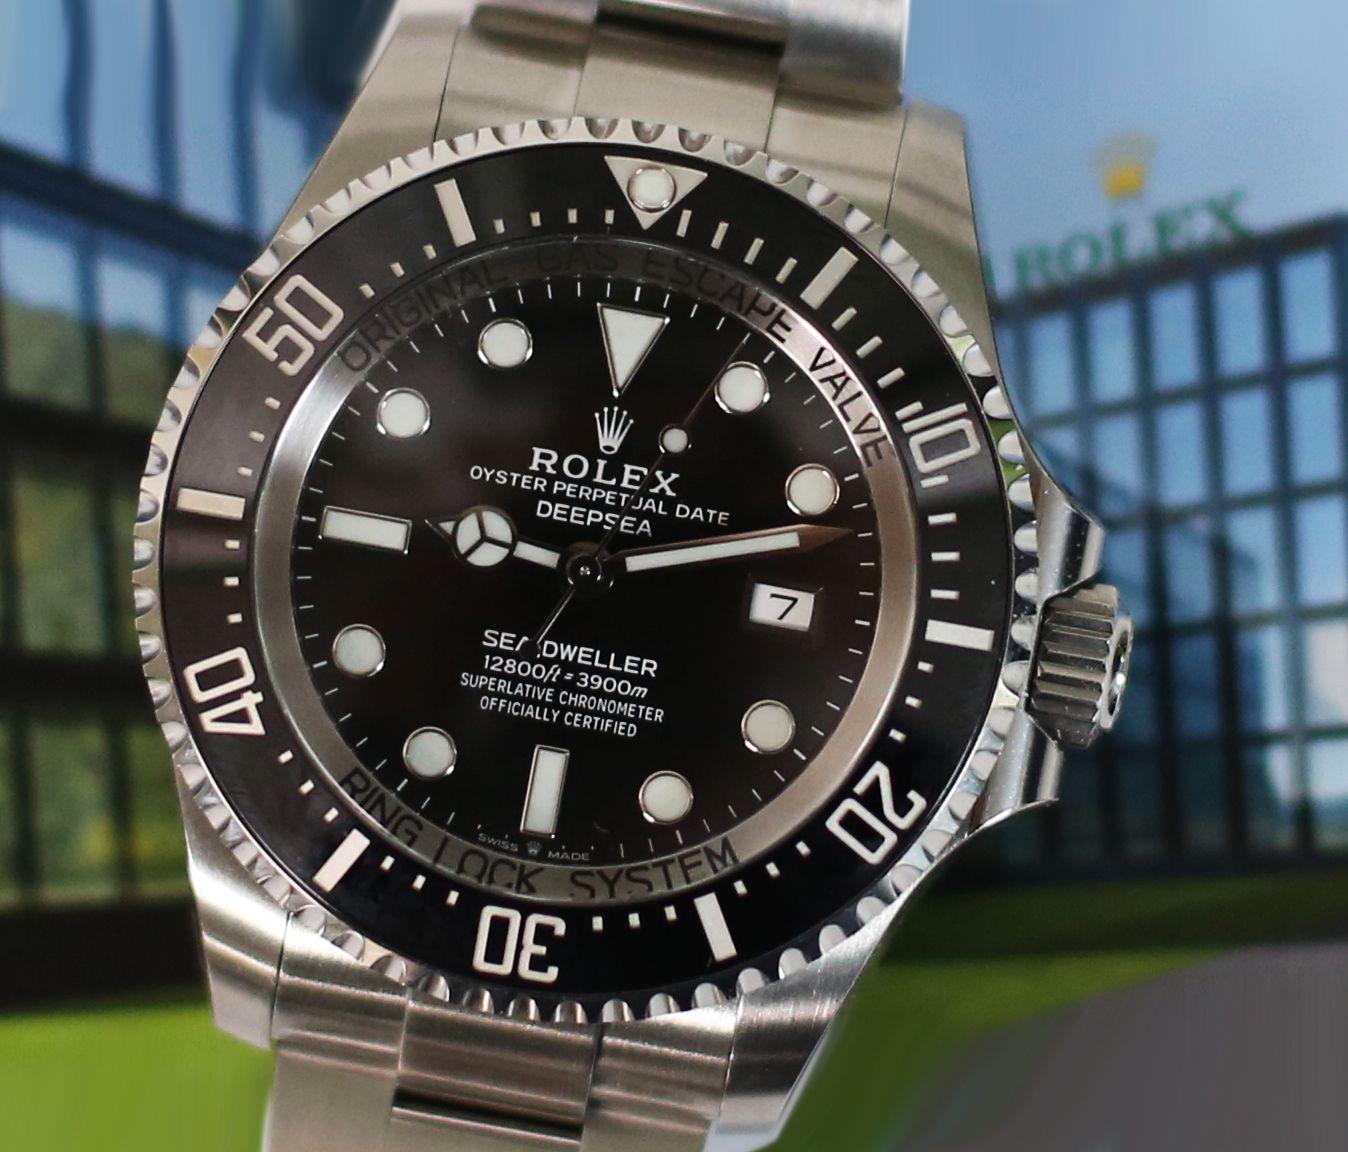 Land Locked Rolex 44mm Seadweller Deepsea Ref 126660 Baselworld 2018 Edition Http Www Elementintime Rolex Sea Dweller Rolex Rolex Oyster Perpetual